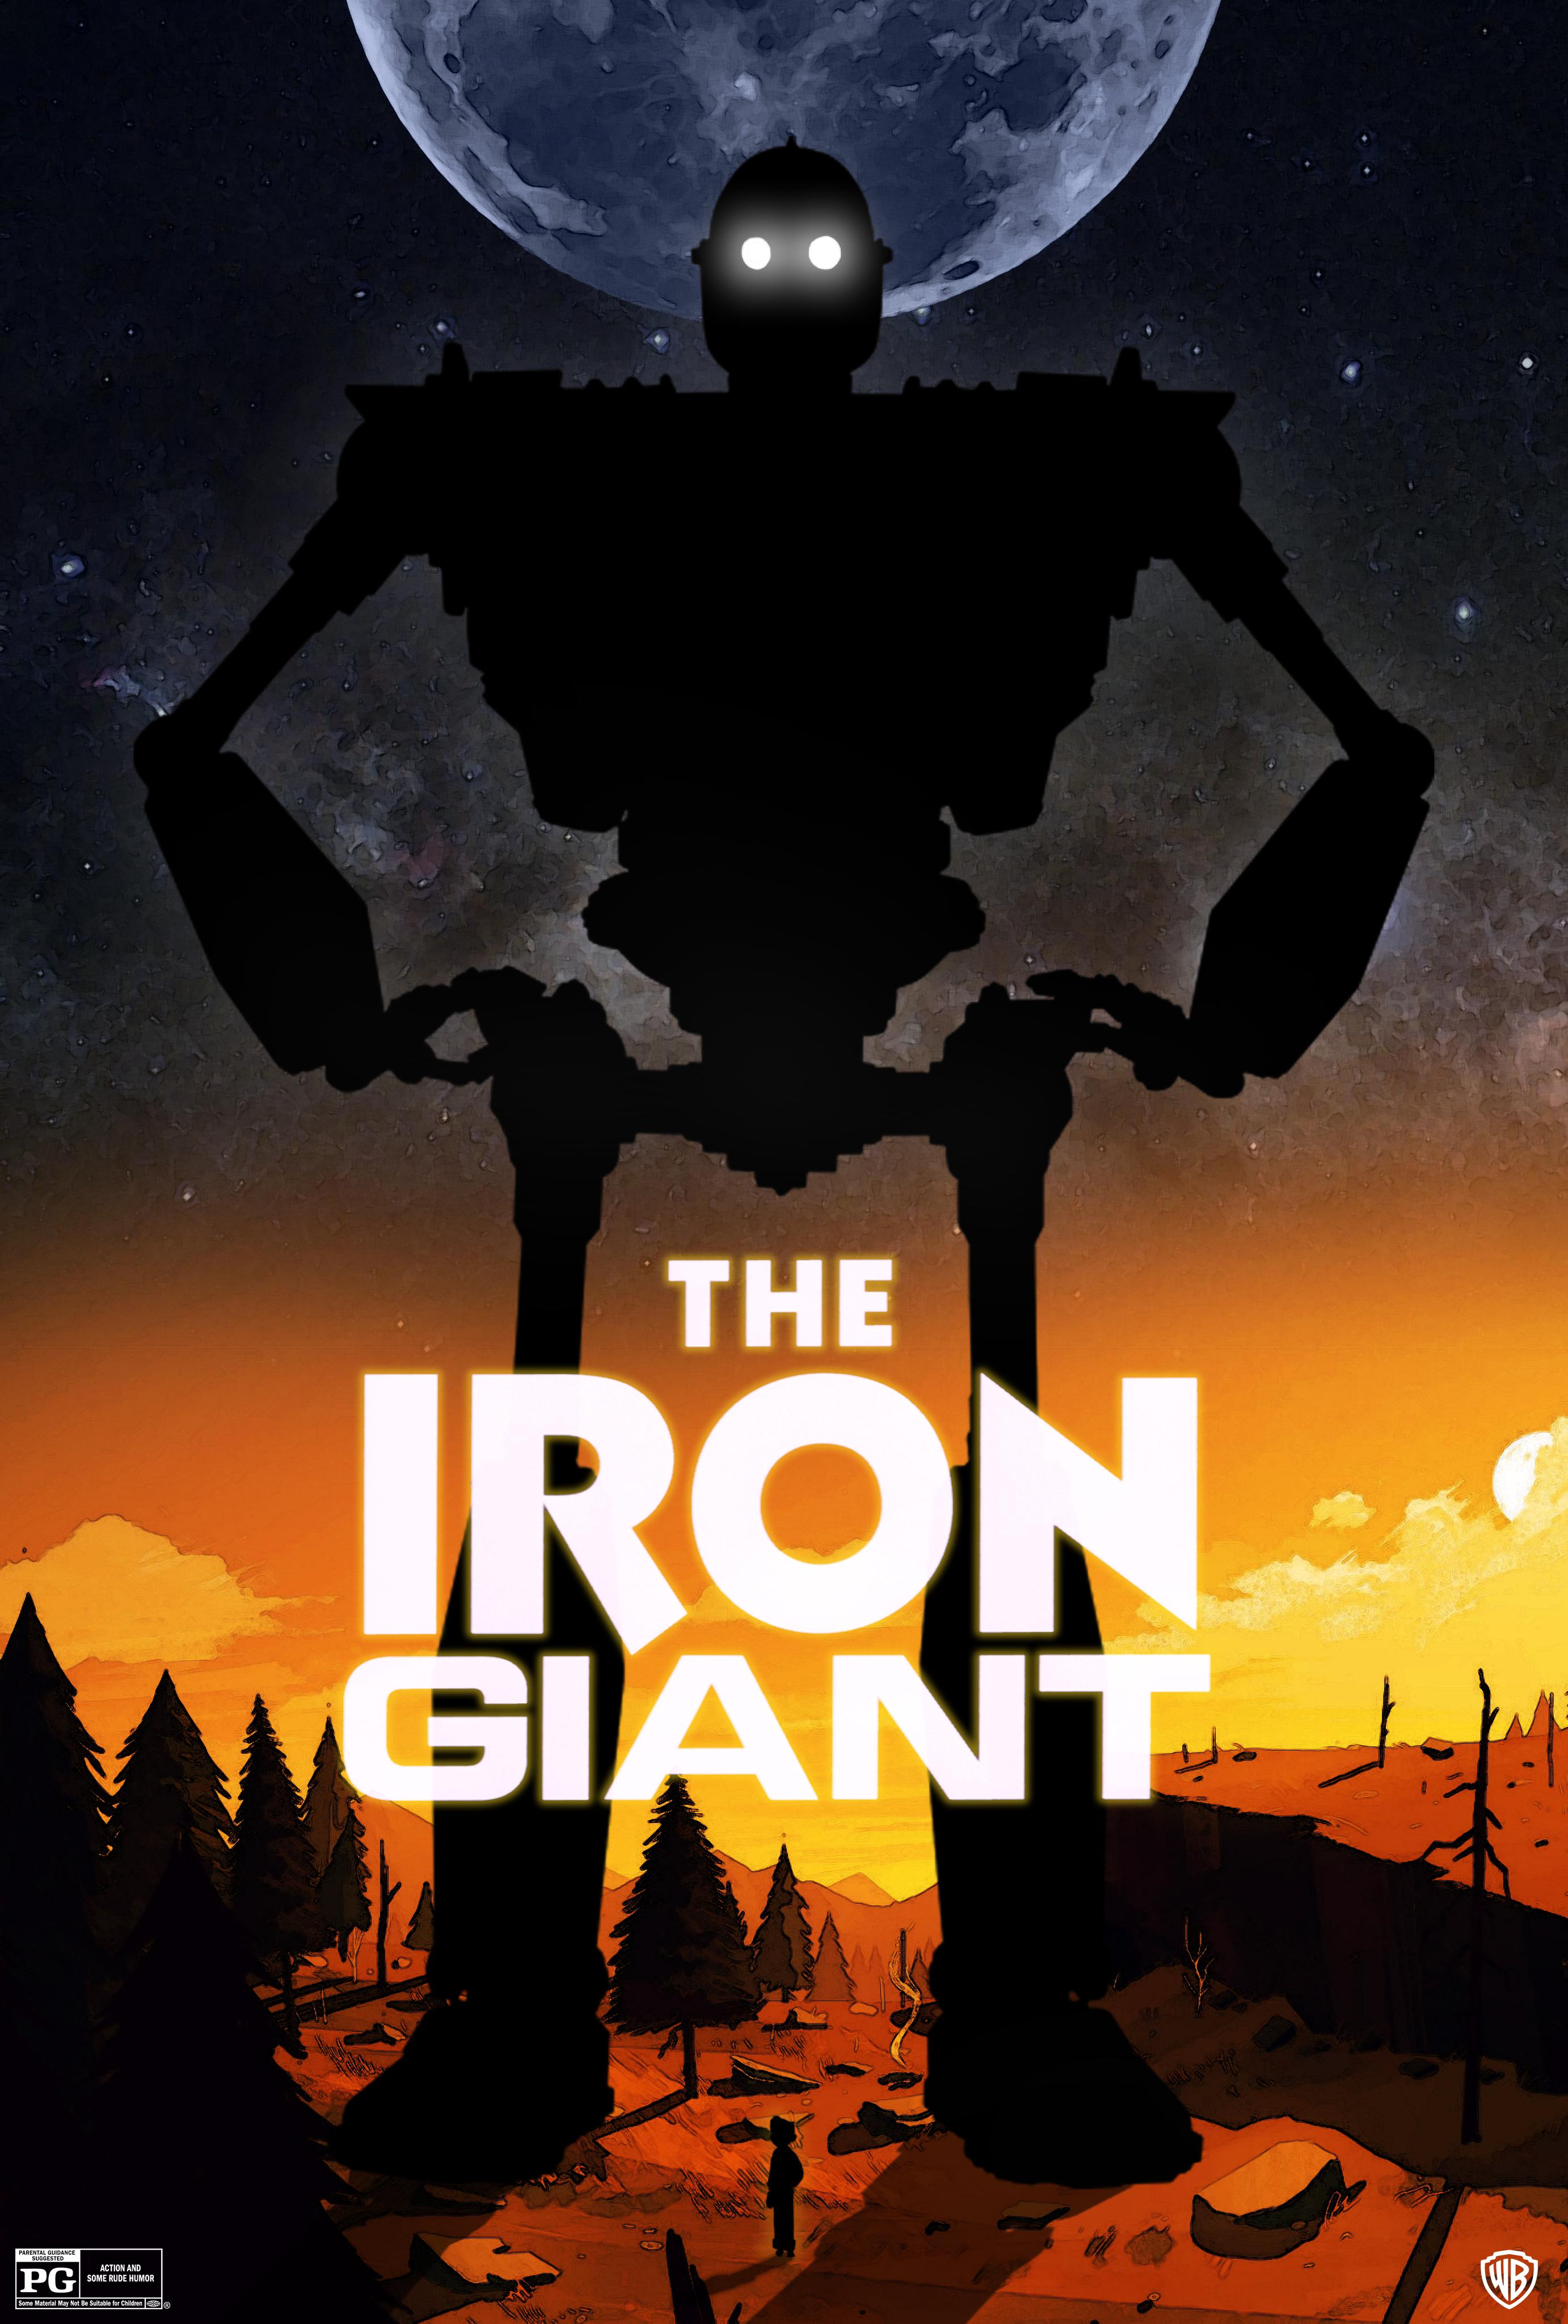 The Iron Giant OC ART Project - Beautifully designed interstellar posters james fletcher